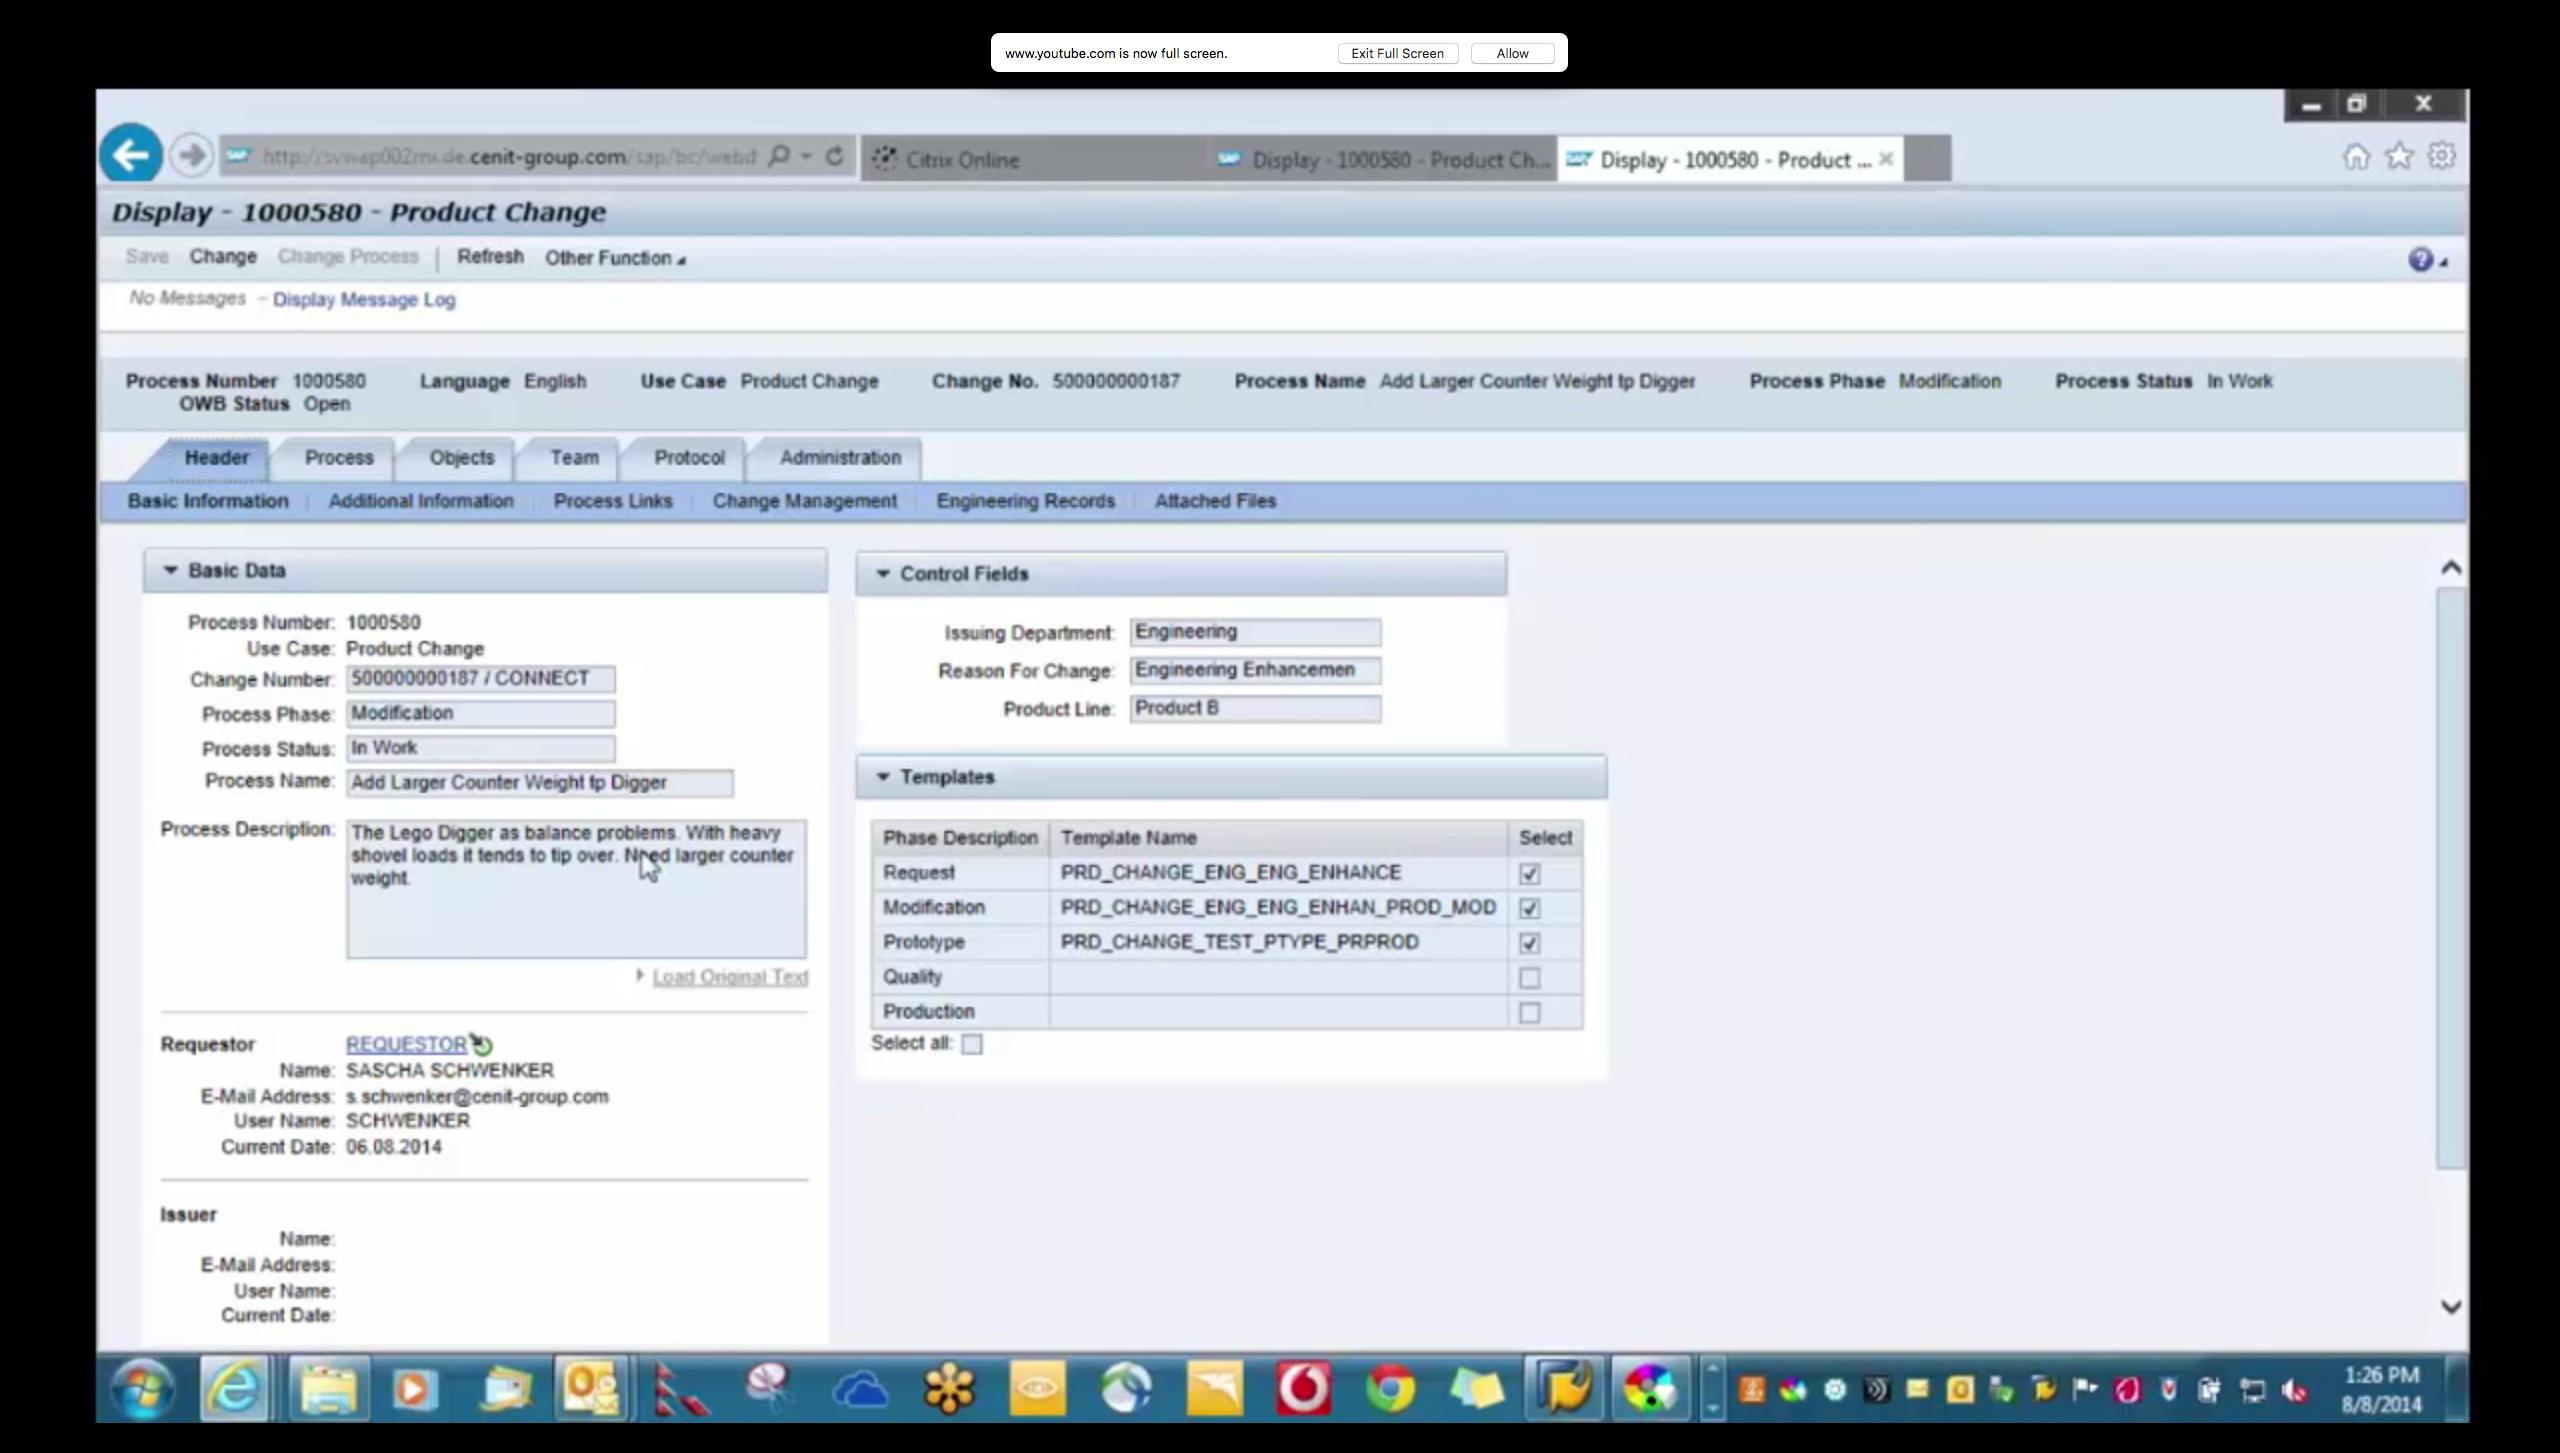 SAP PLM Demo - SAP+PLM+Screen+Shot+1.png